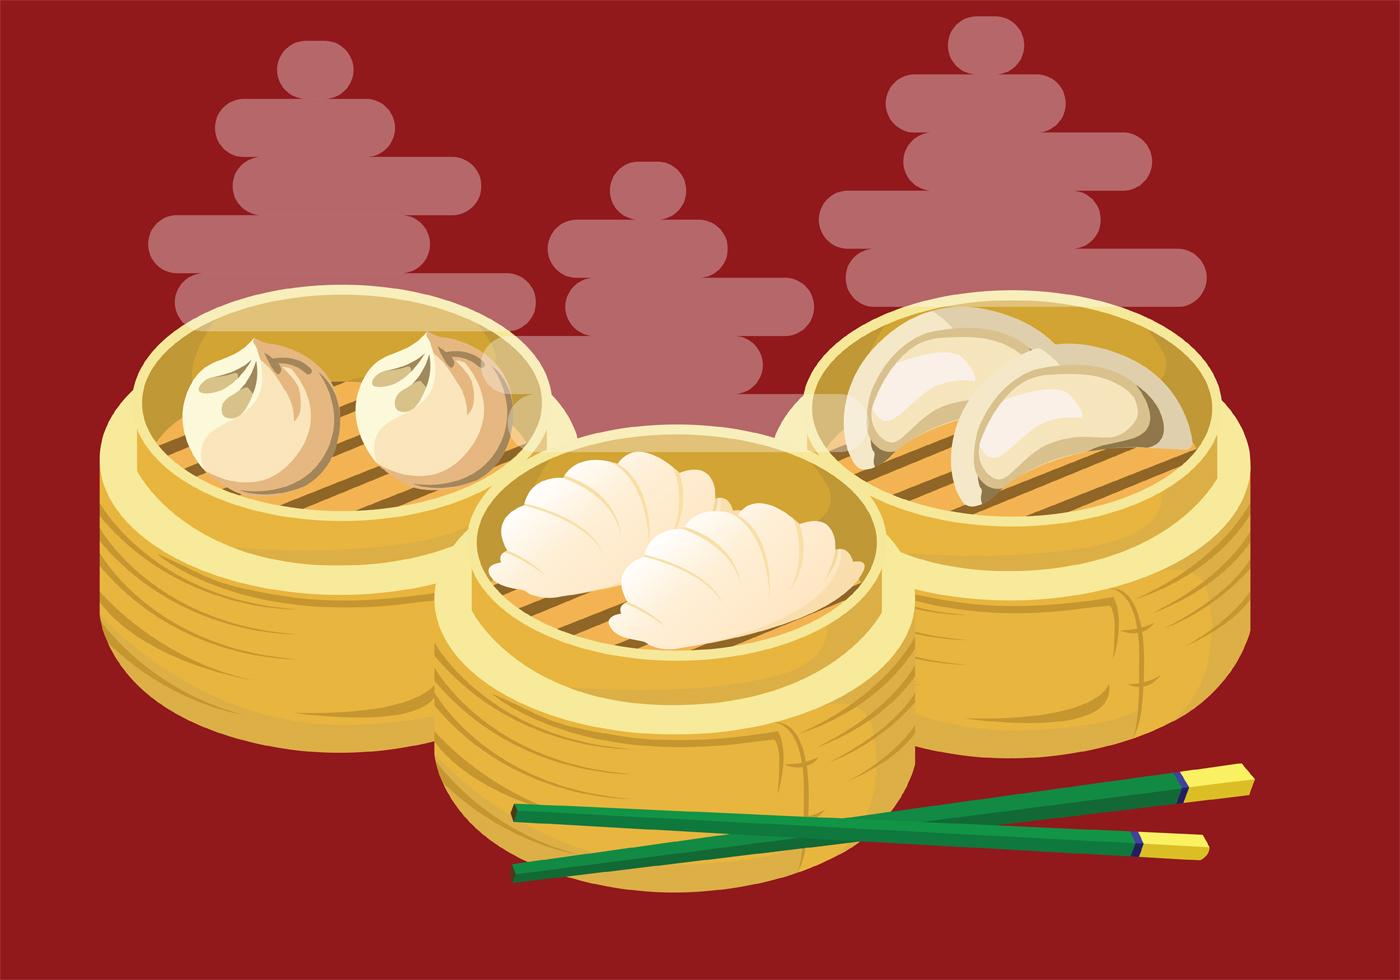 Cute Chinese Cartoon Wallpaper Dumplings Vector Art Download Free Vector Art Stock